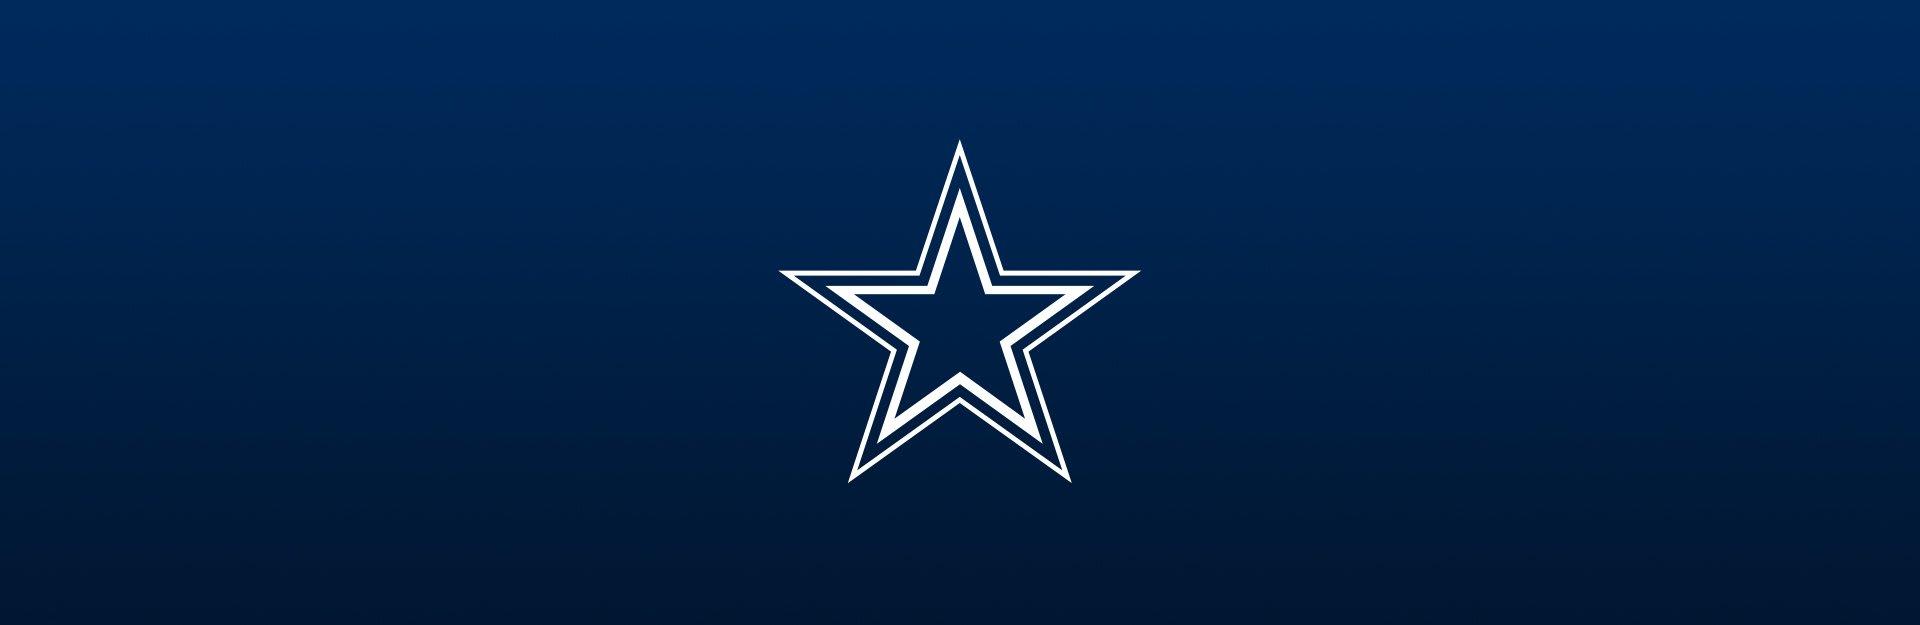 Dallas Cowboys logo on navy blue background